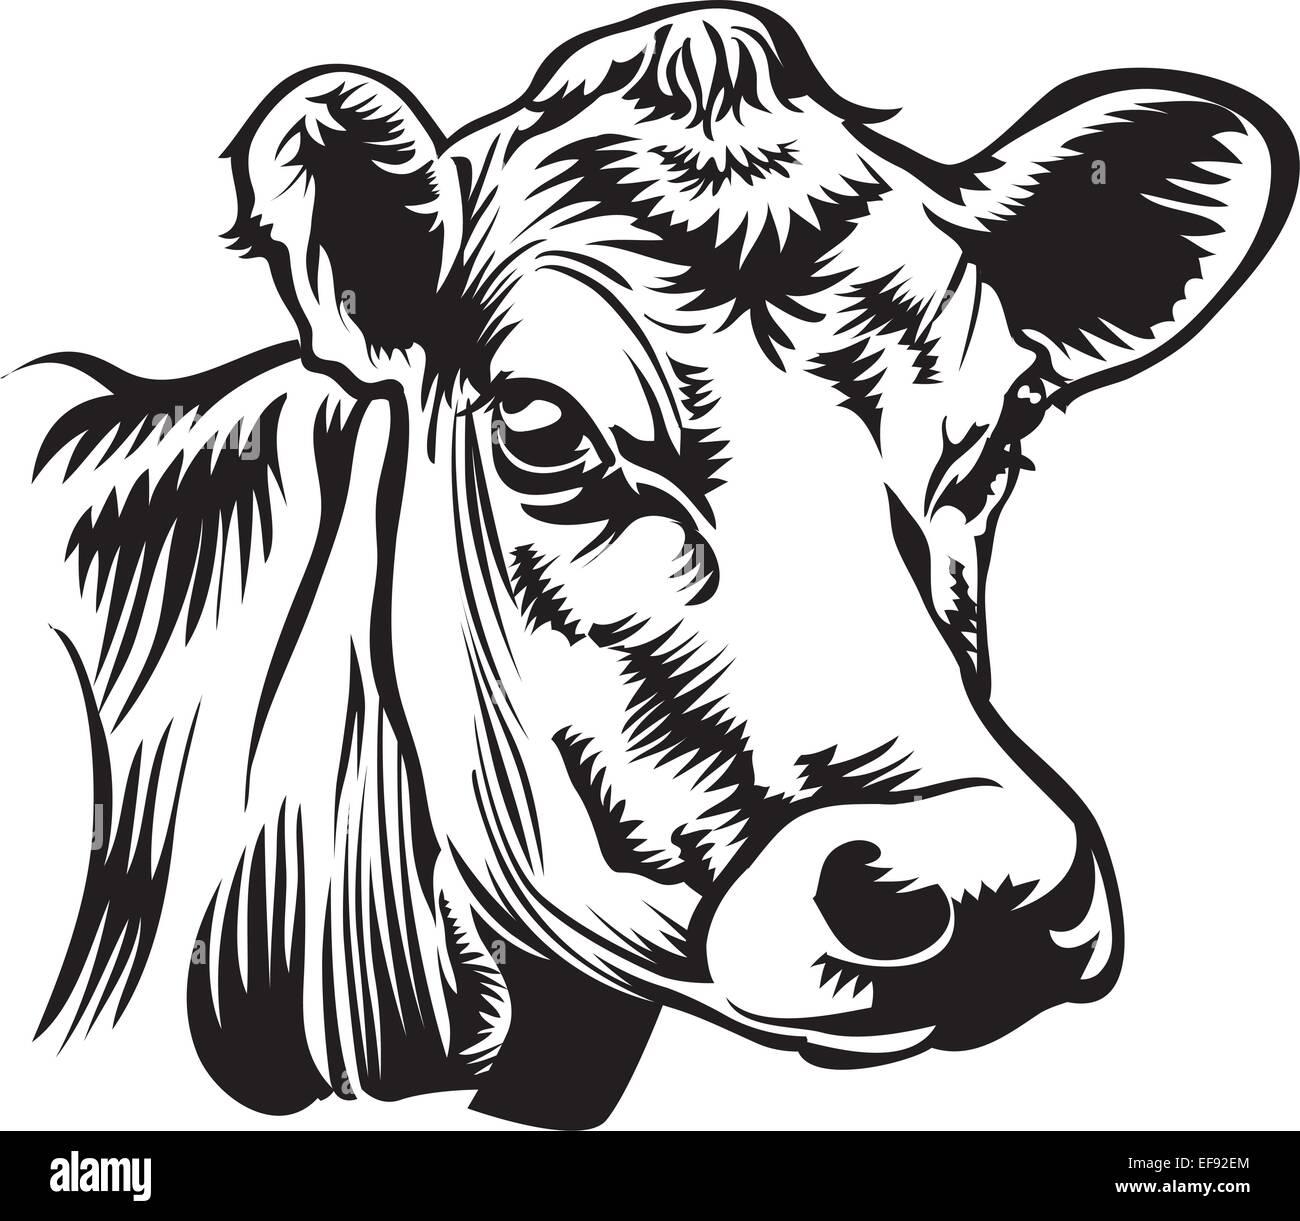 Uncategorized Cow Head Drawing a cows head stock vector art illustration image head